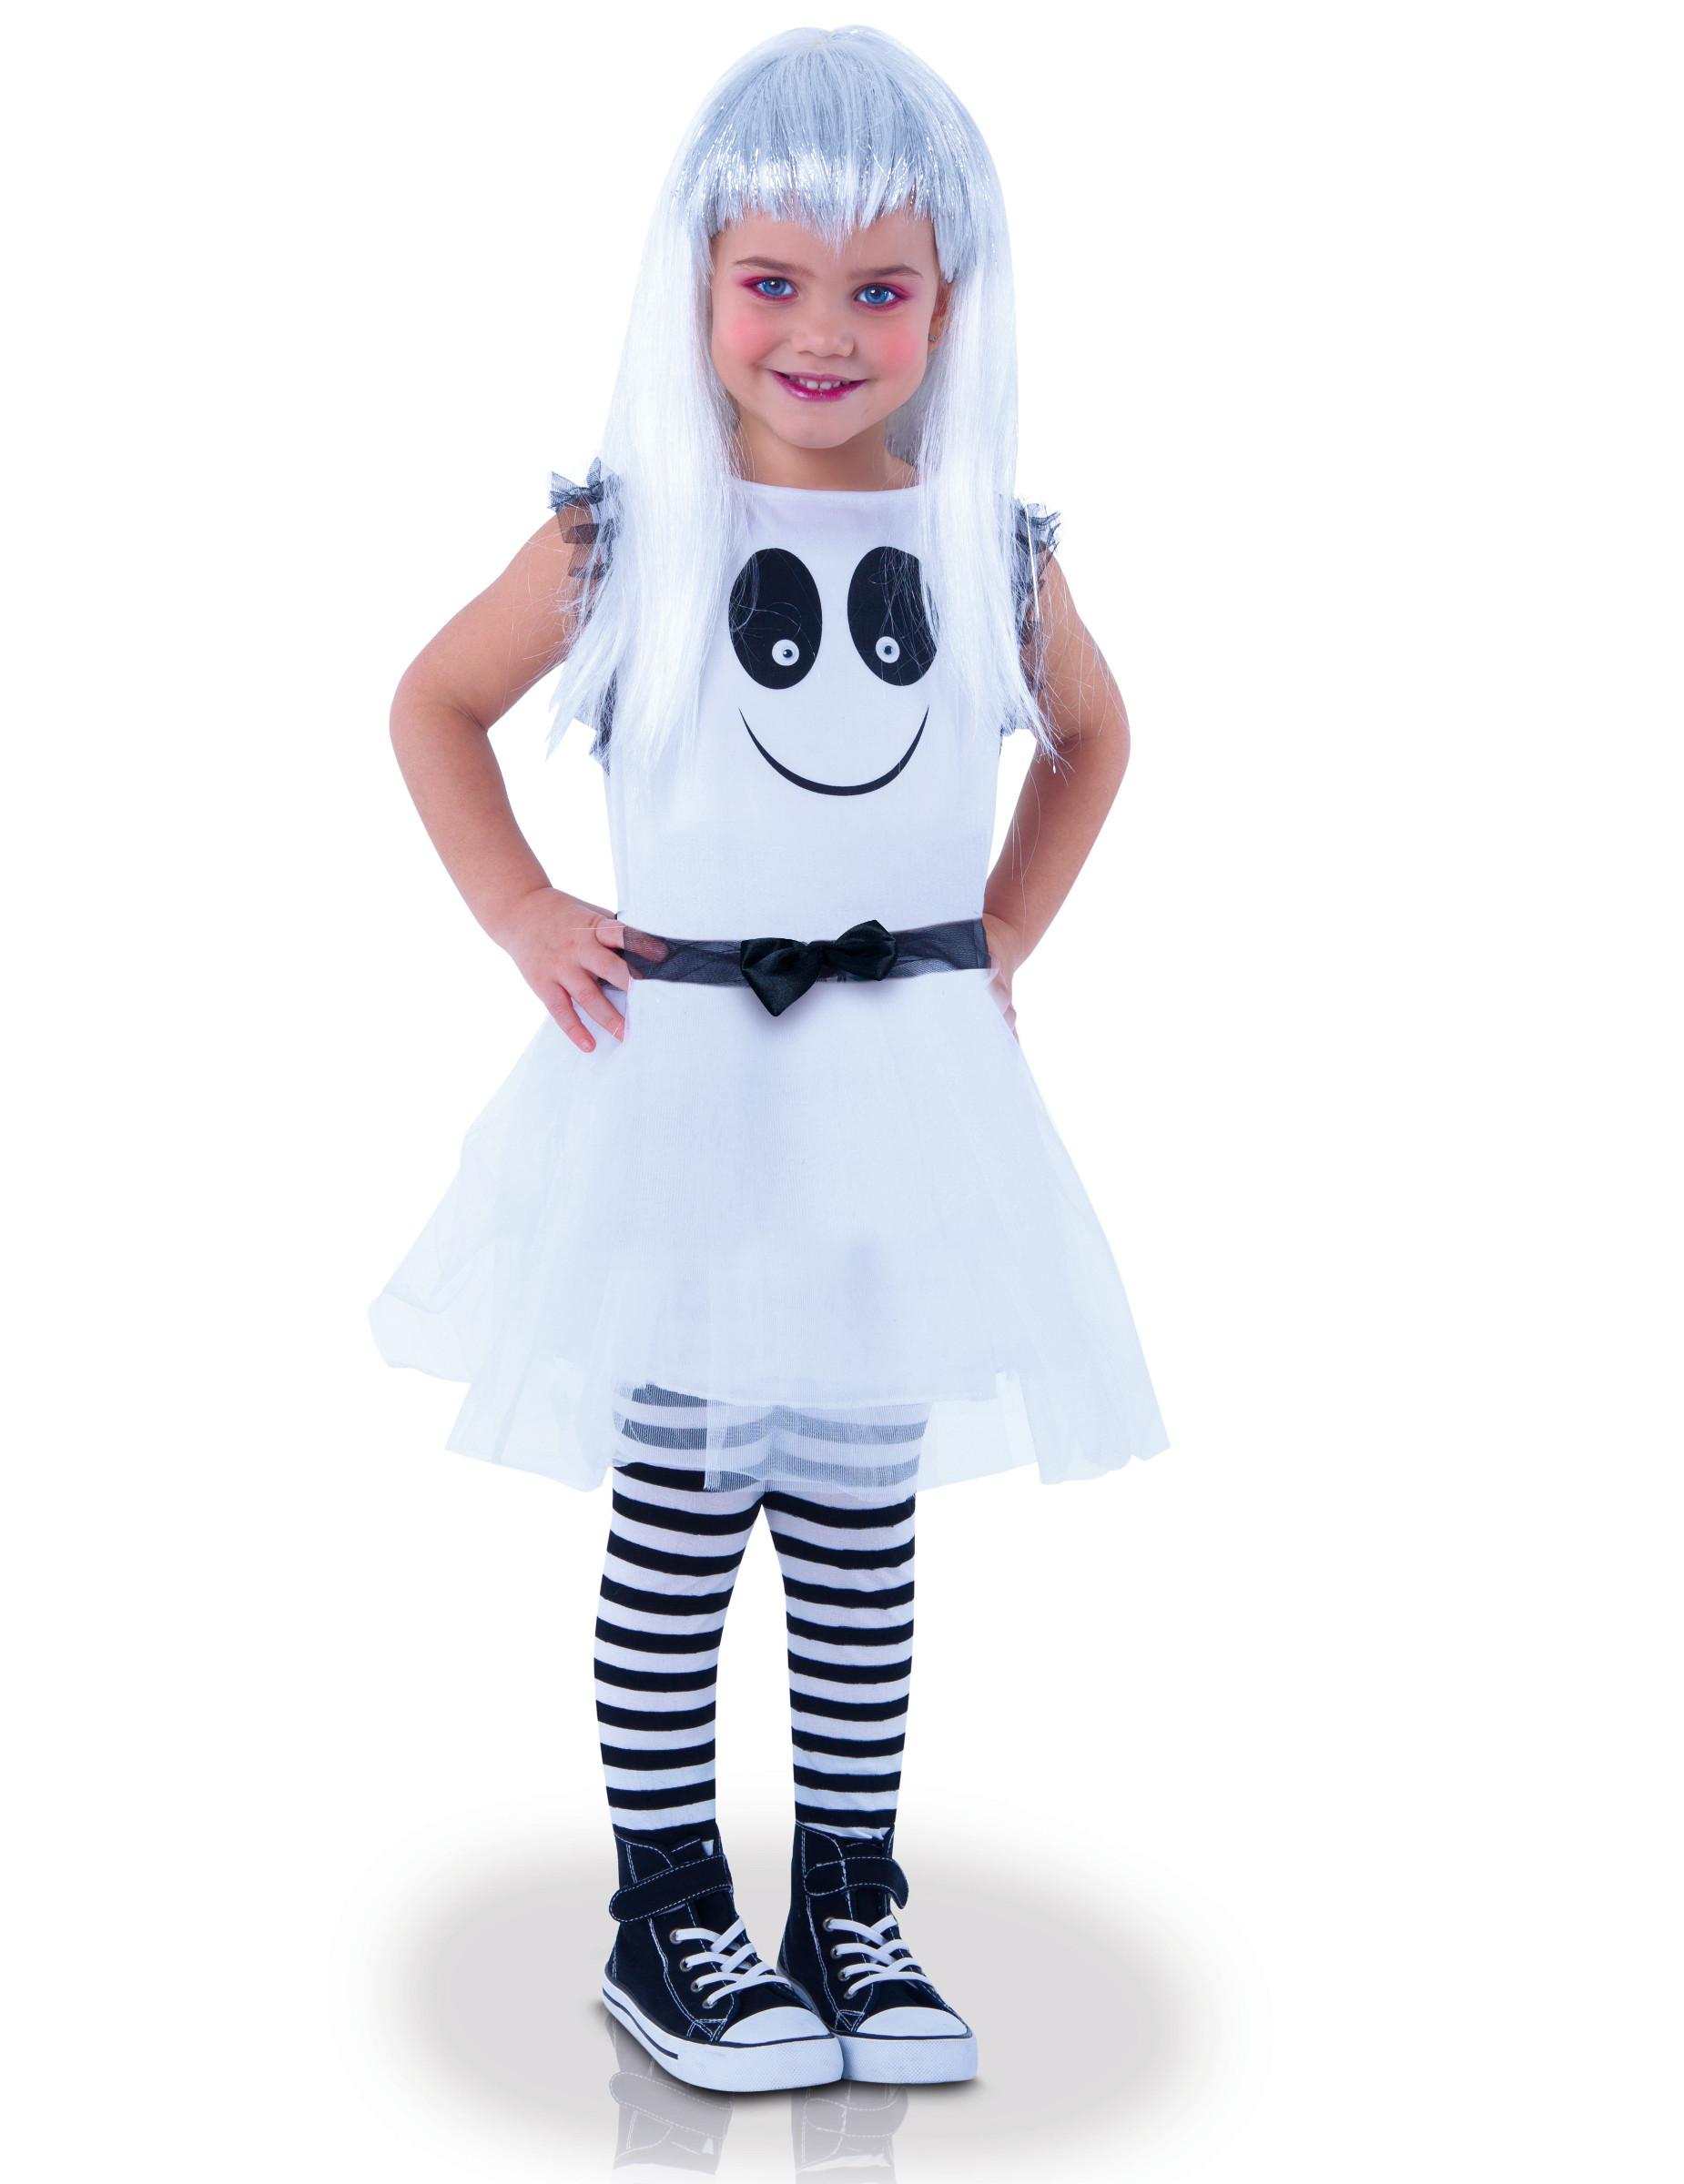 69dbfa395f5a Vestiti da fantasmi per bambini per Halloween - Costumi da fantasmi